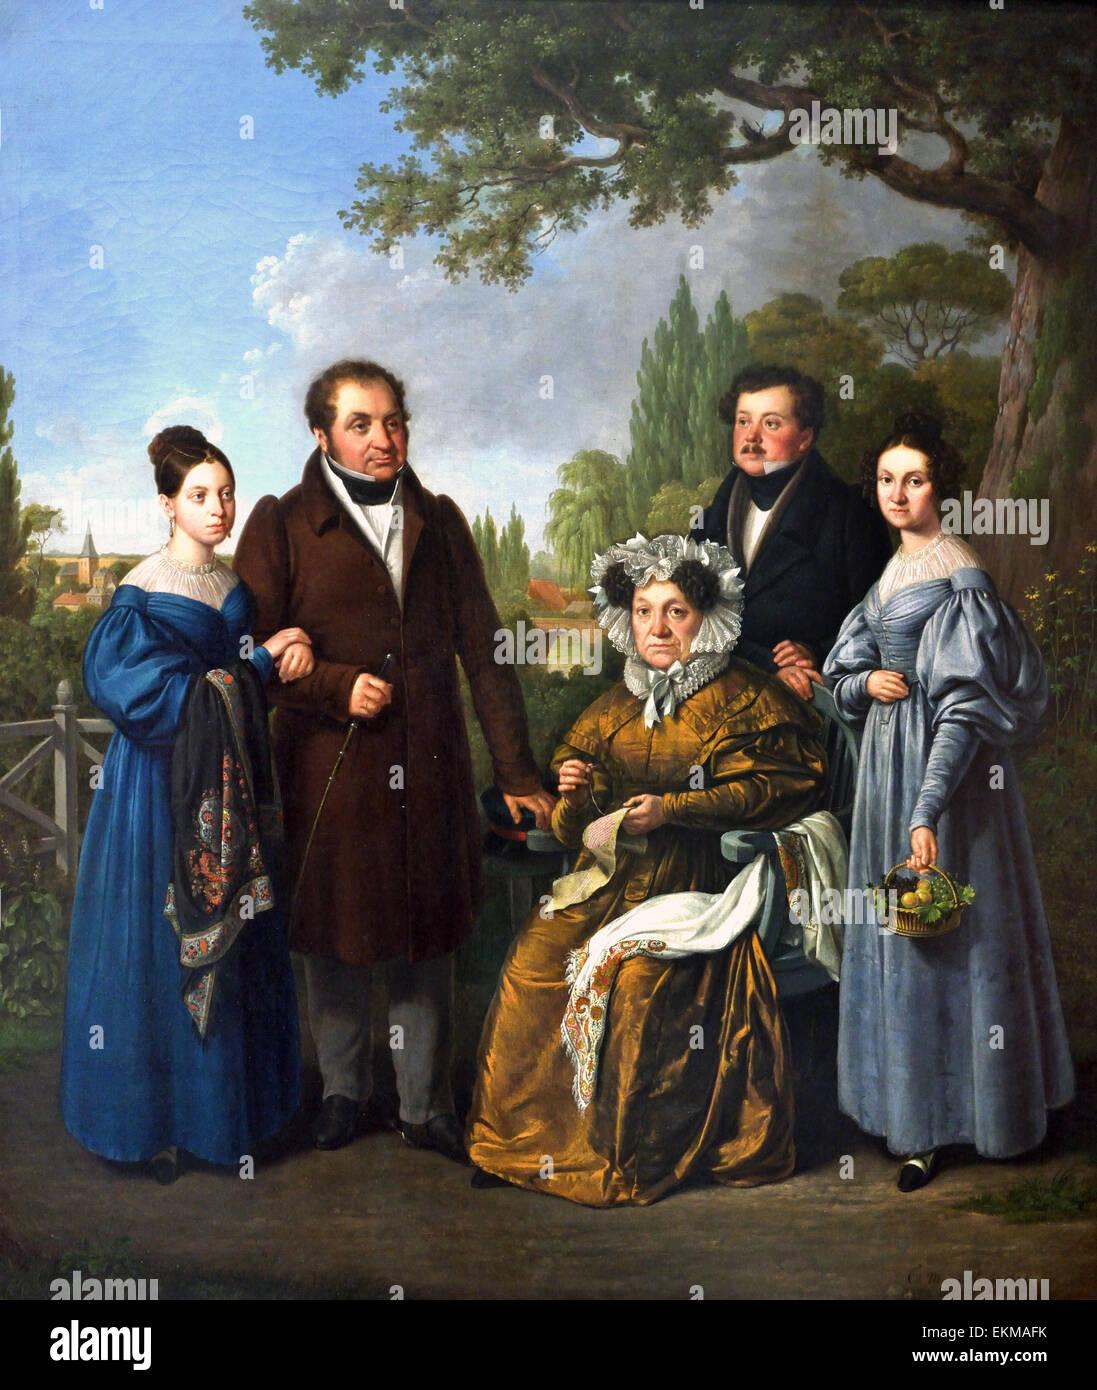 Windgassen Family 1834 Egidius Mengelberg 1770-1849 German Germany - Stock Image